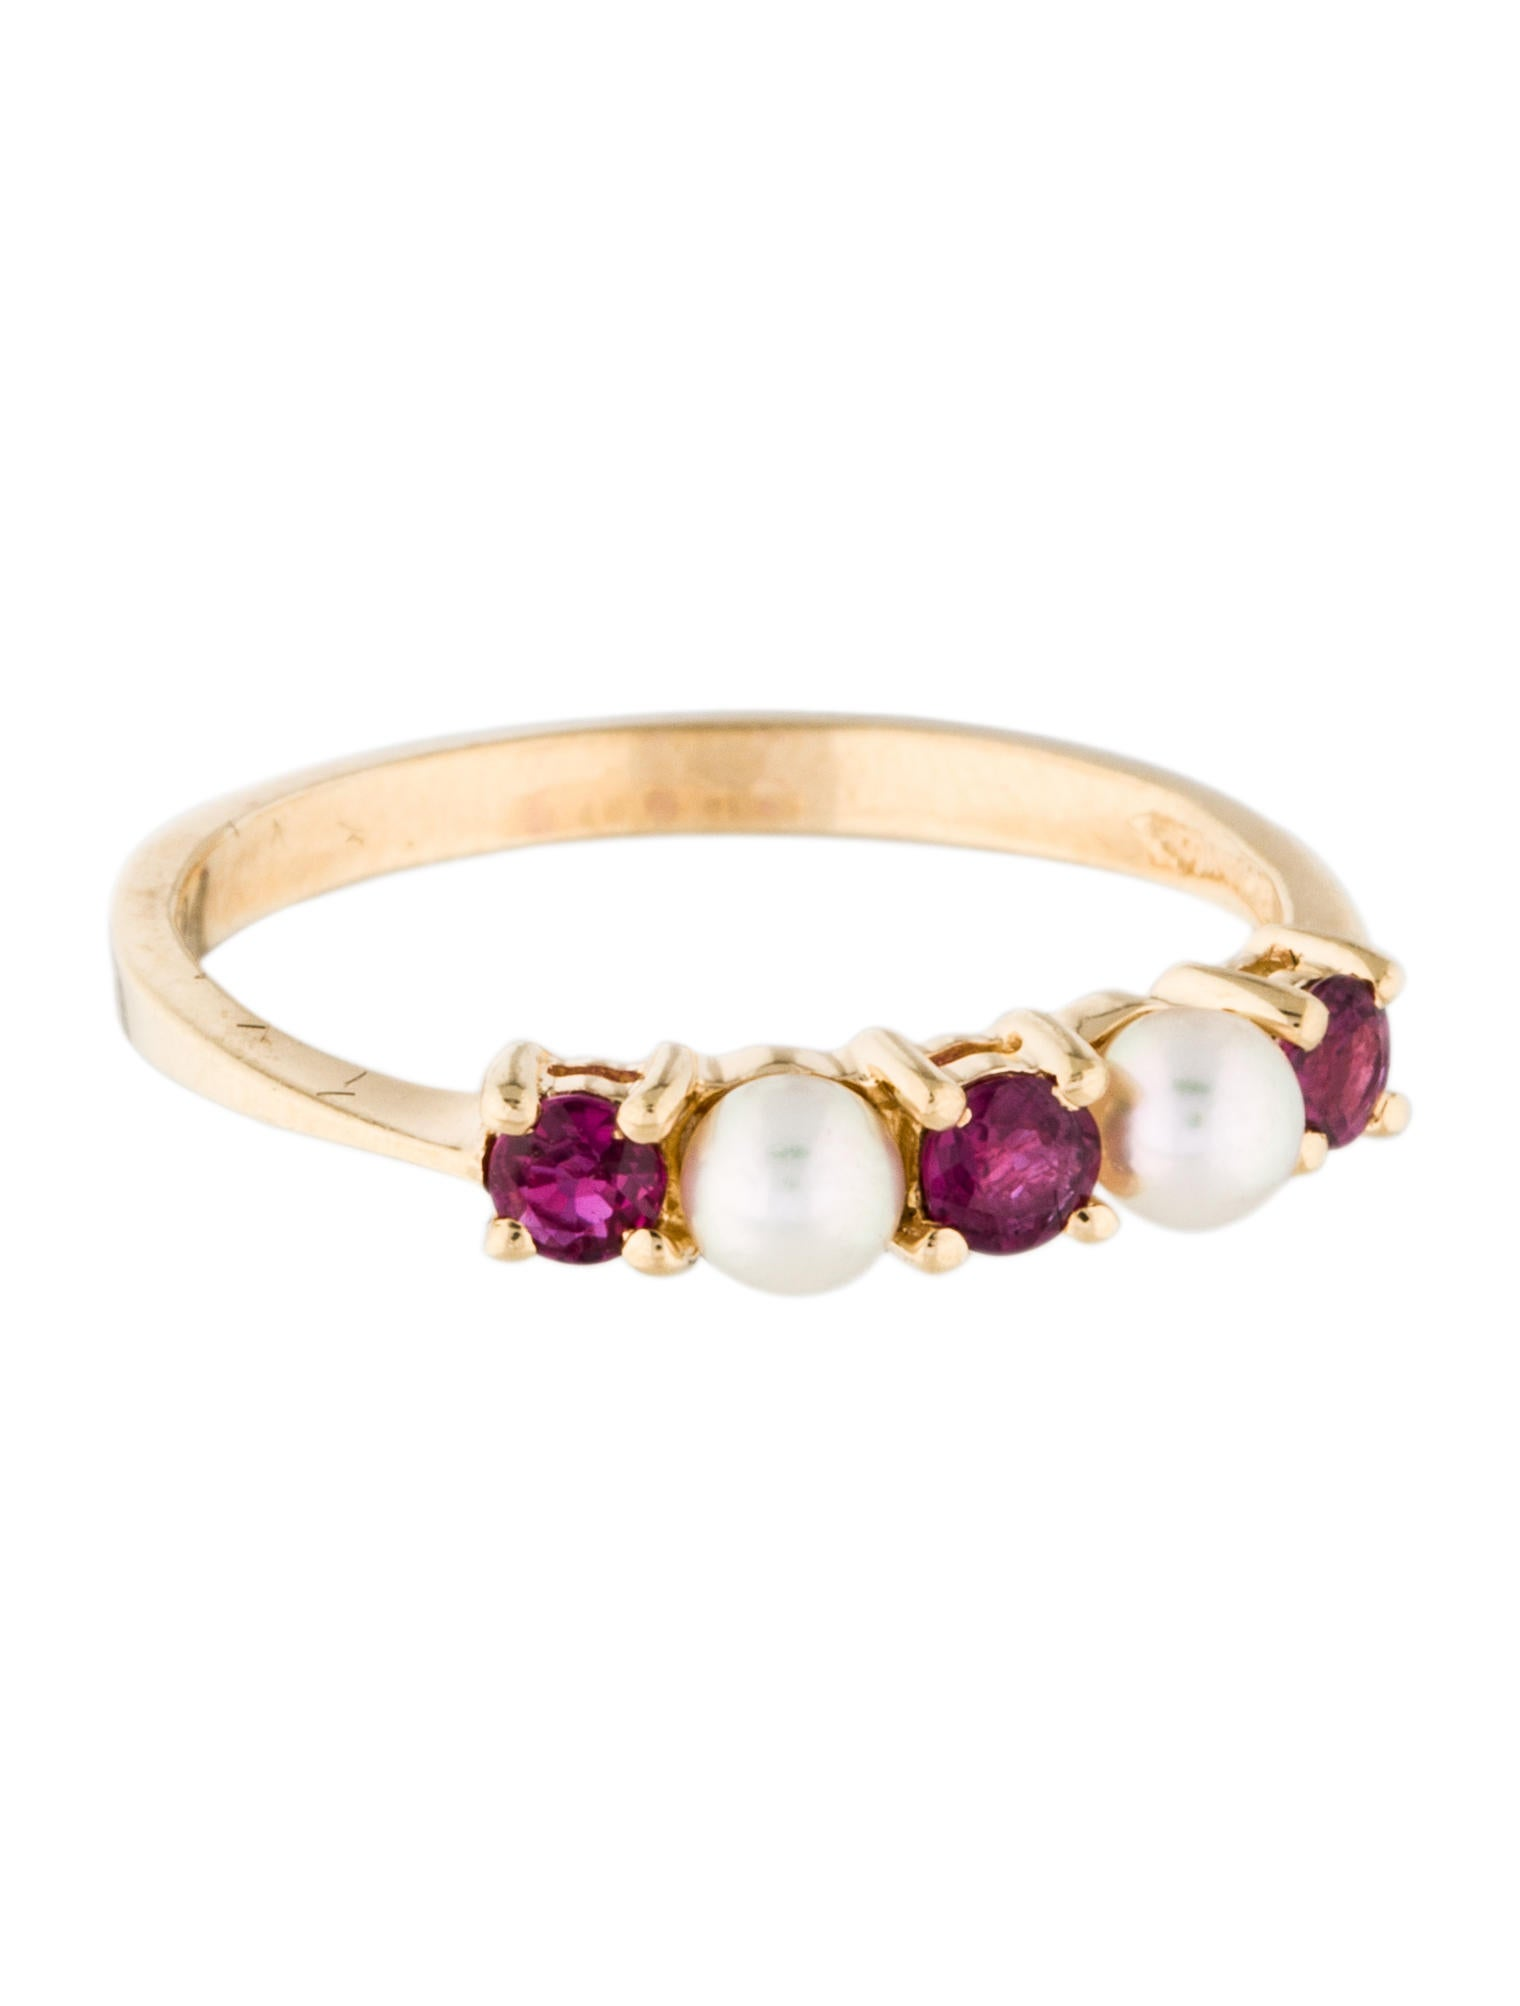 Tiffany Amp Co 14k Ruby Amp Pearl Ring Rings Tif50856